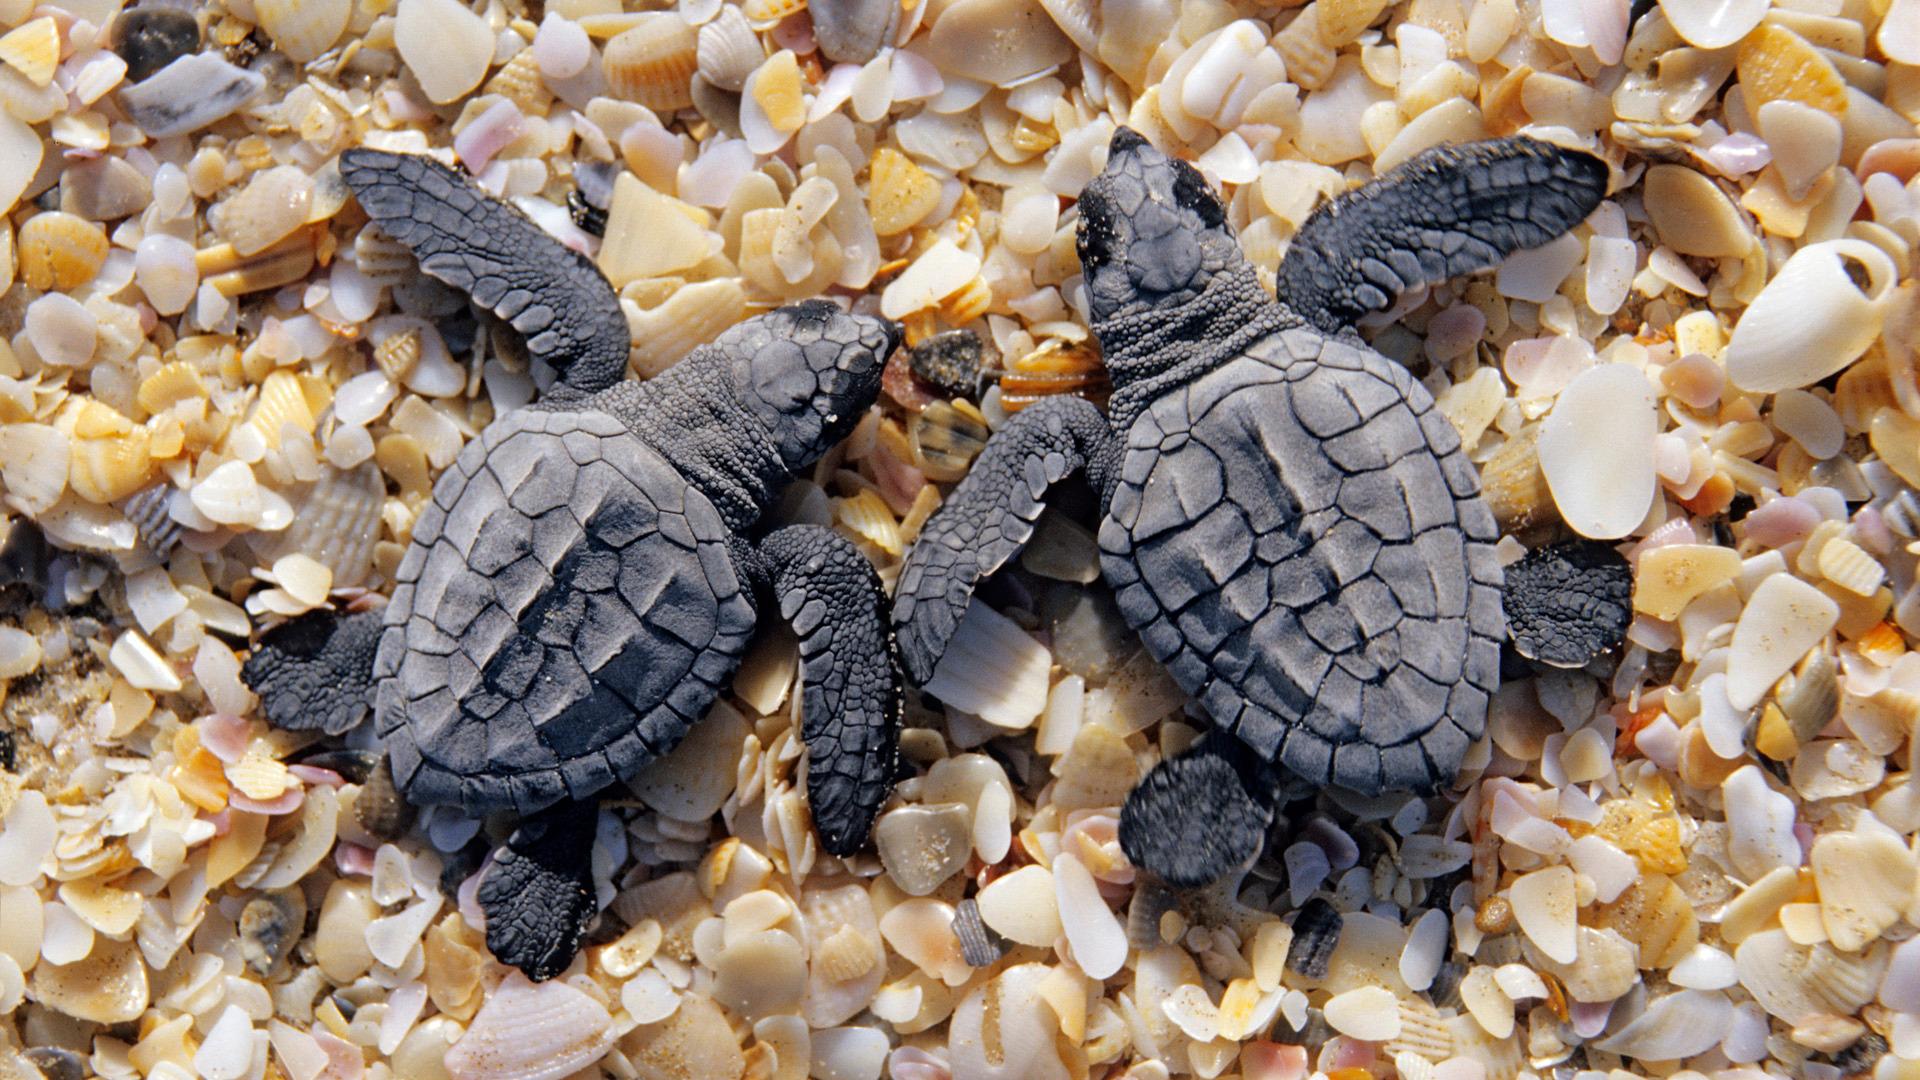 Baby turtles wallpaper 6628 1920x1080